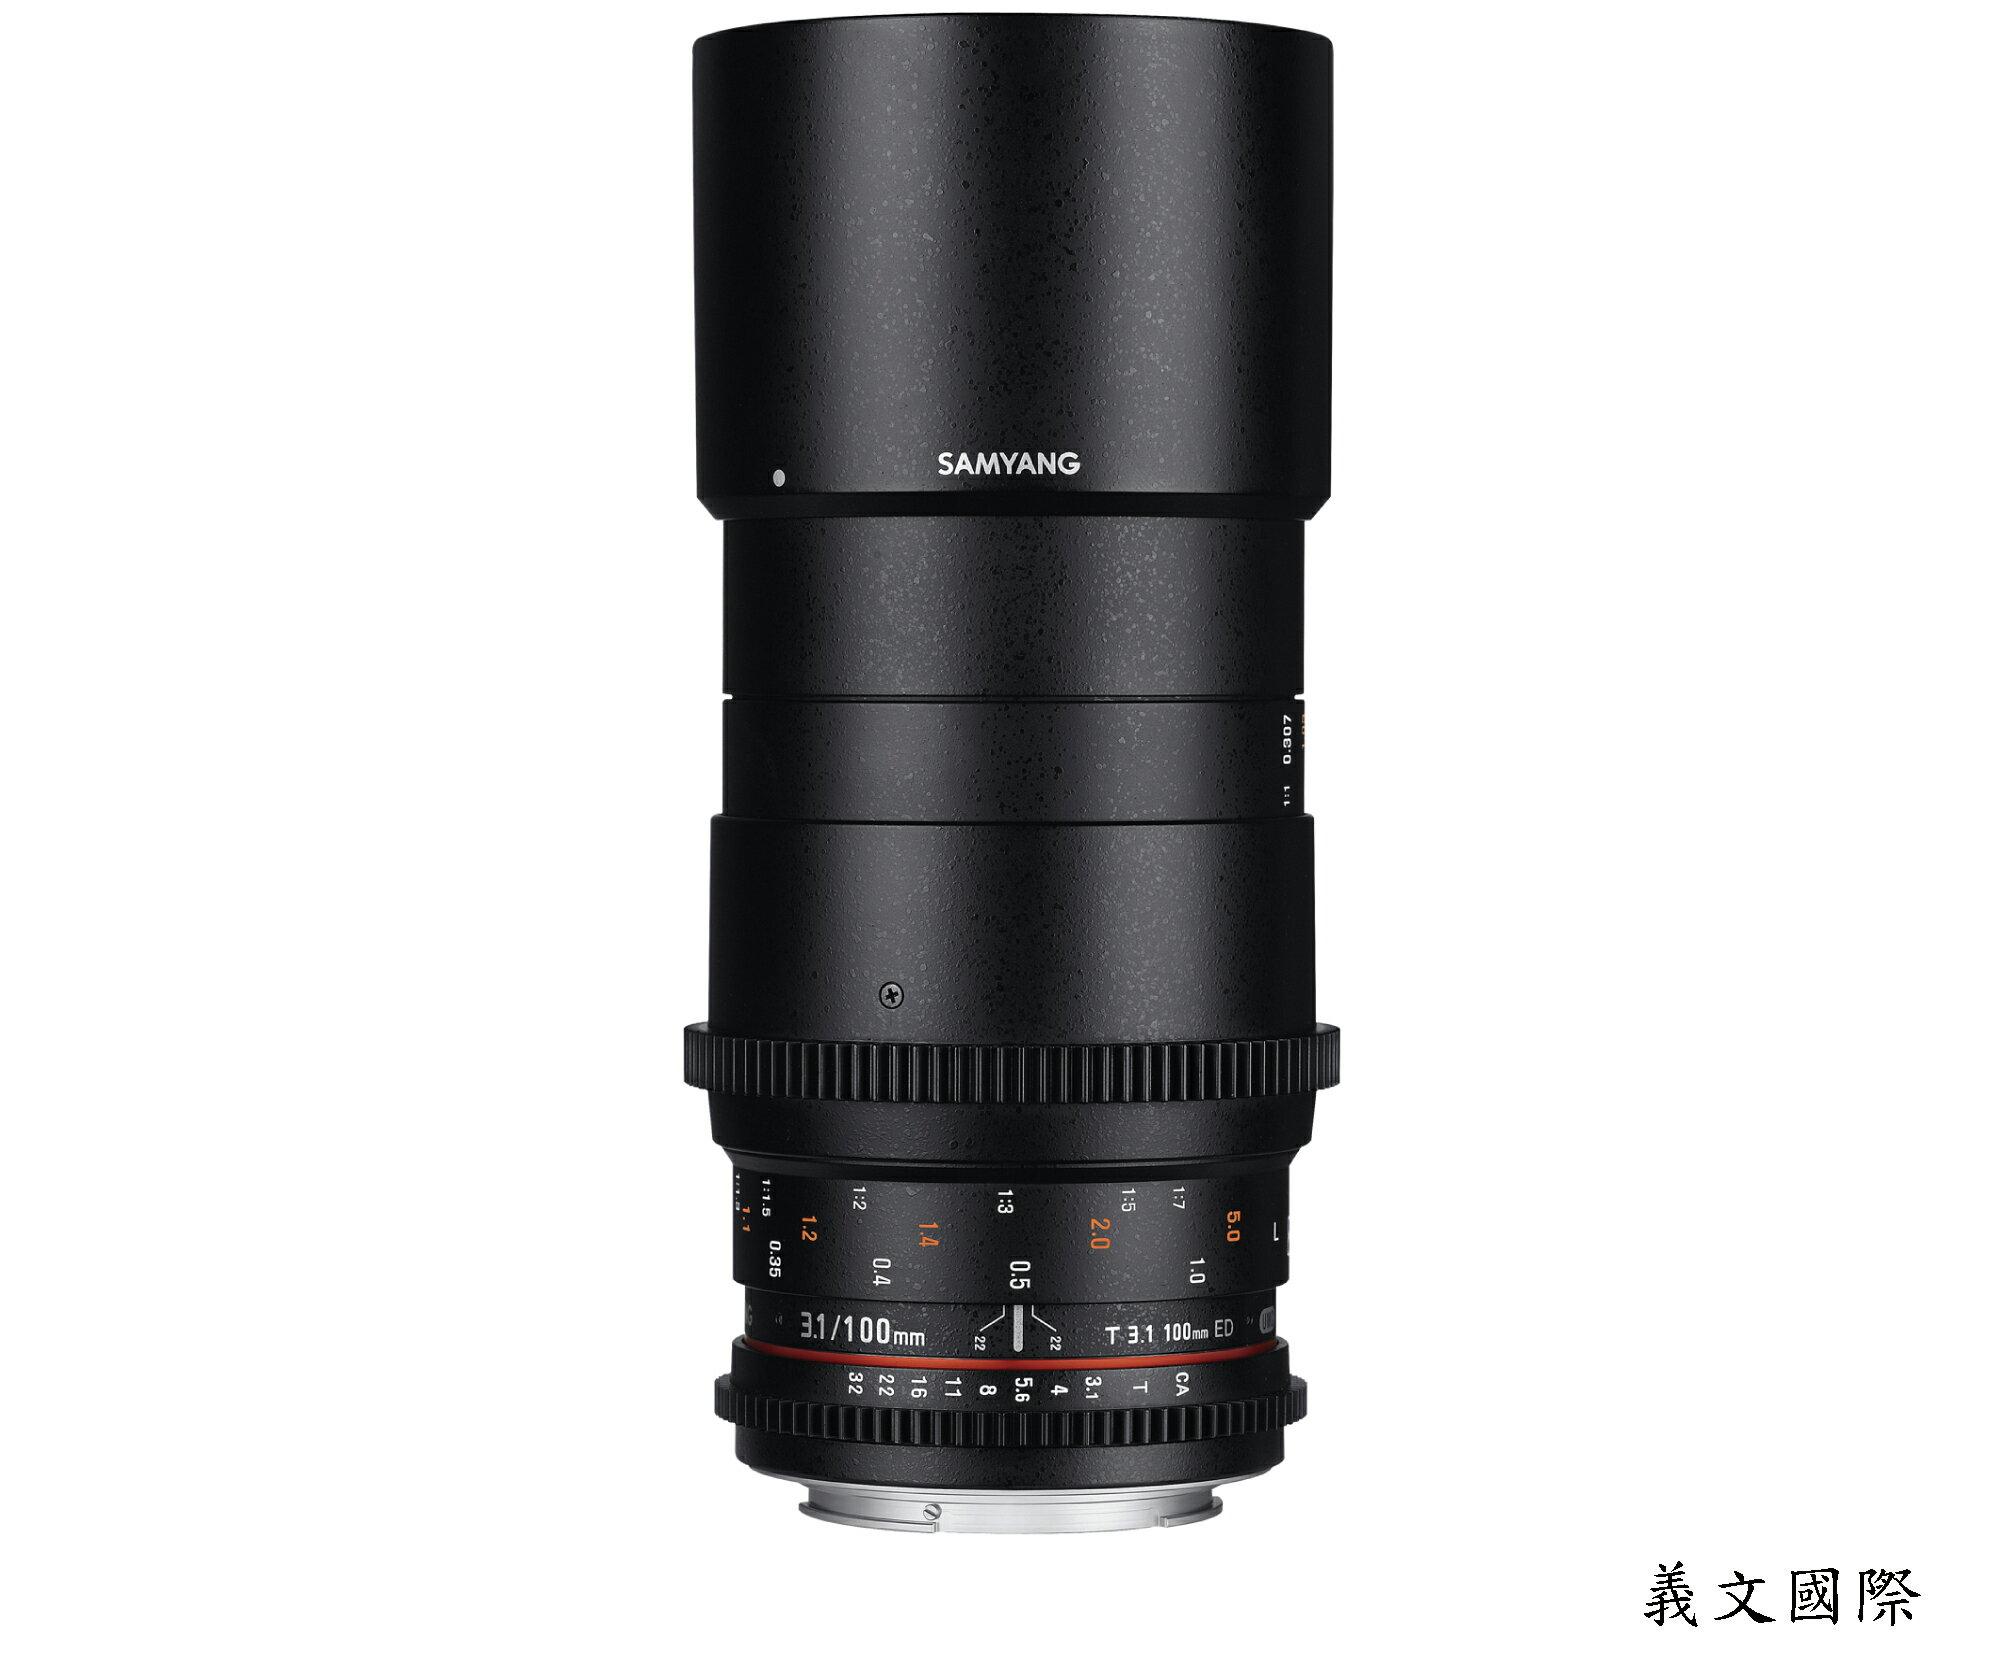 Samyang 鏡頭專賣店:100mm/T3.1 ED UMC MACRO 全幅長焦段近攝鏡頭 for Pentax K